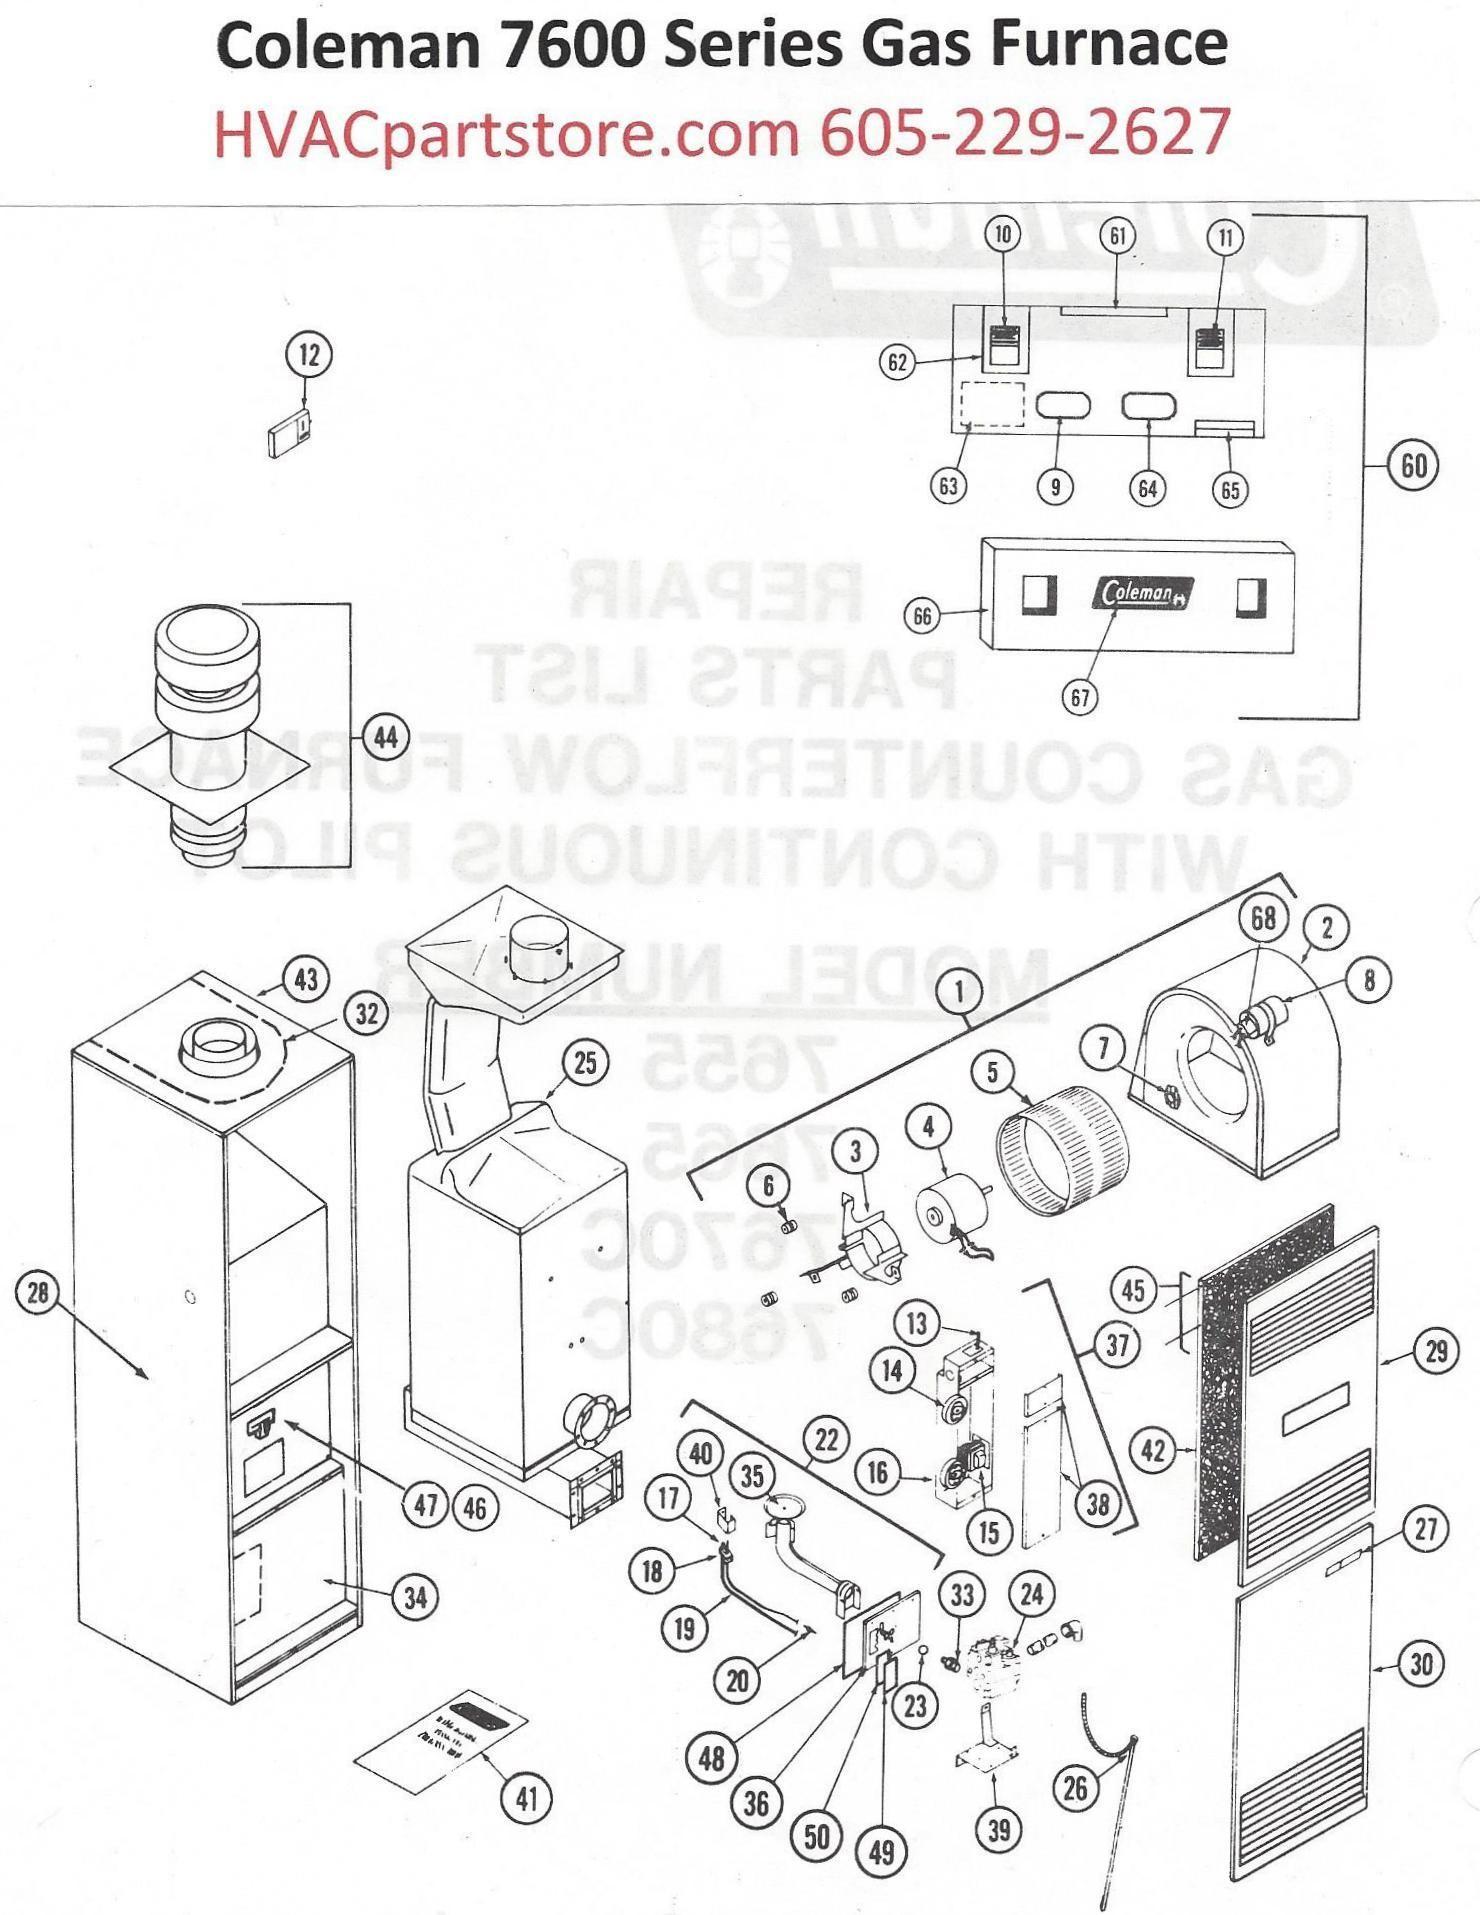 Gas Valve Wiring Diagram 7655 856 Coleman Furnace Parts Post Indicator Hvacpartstore Of